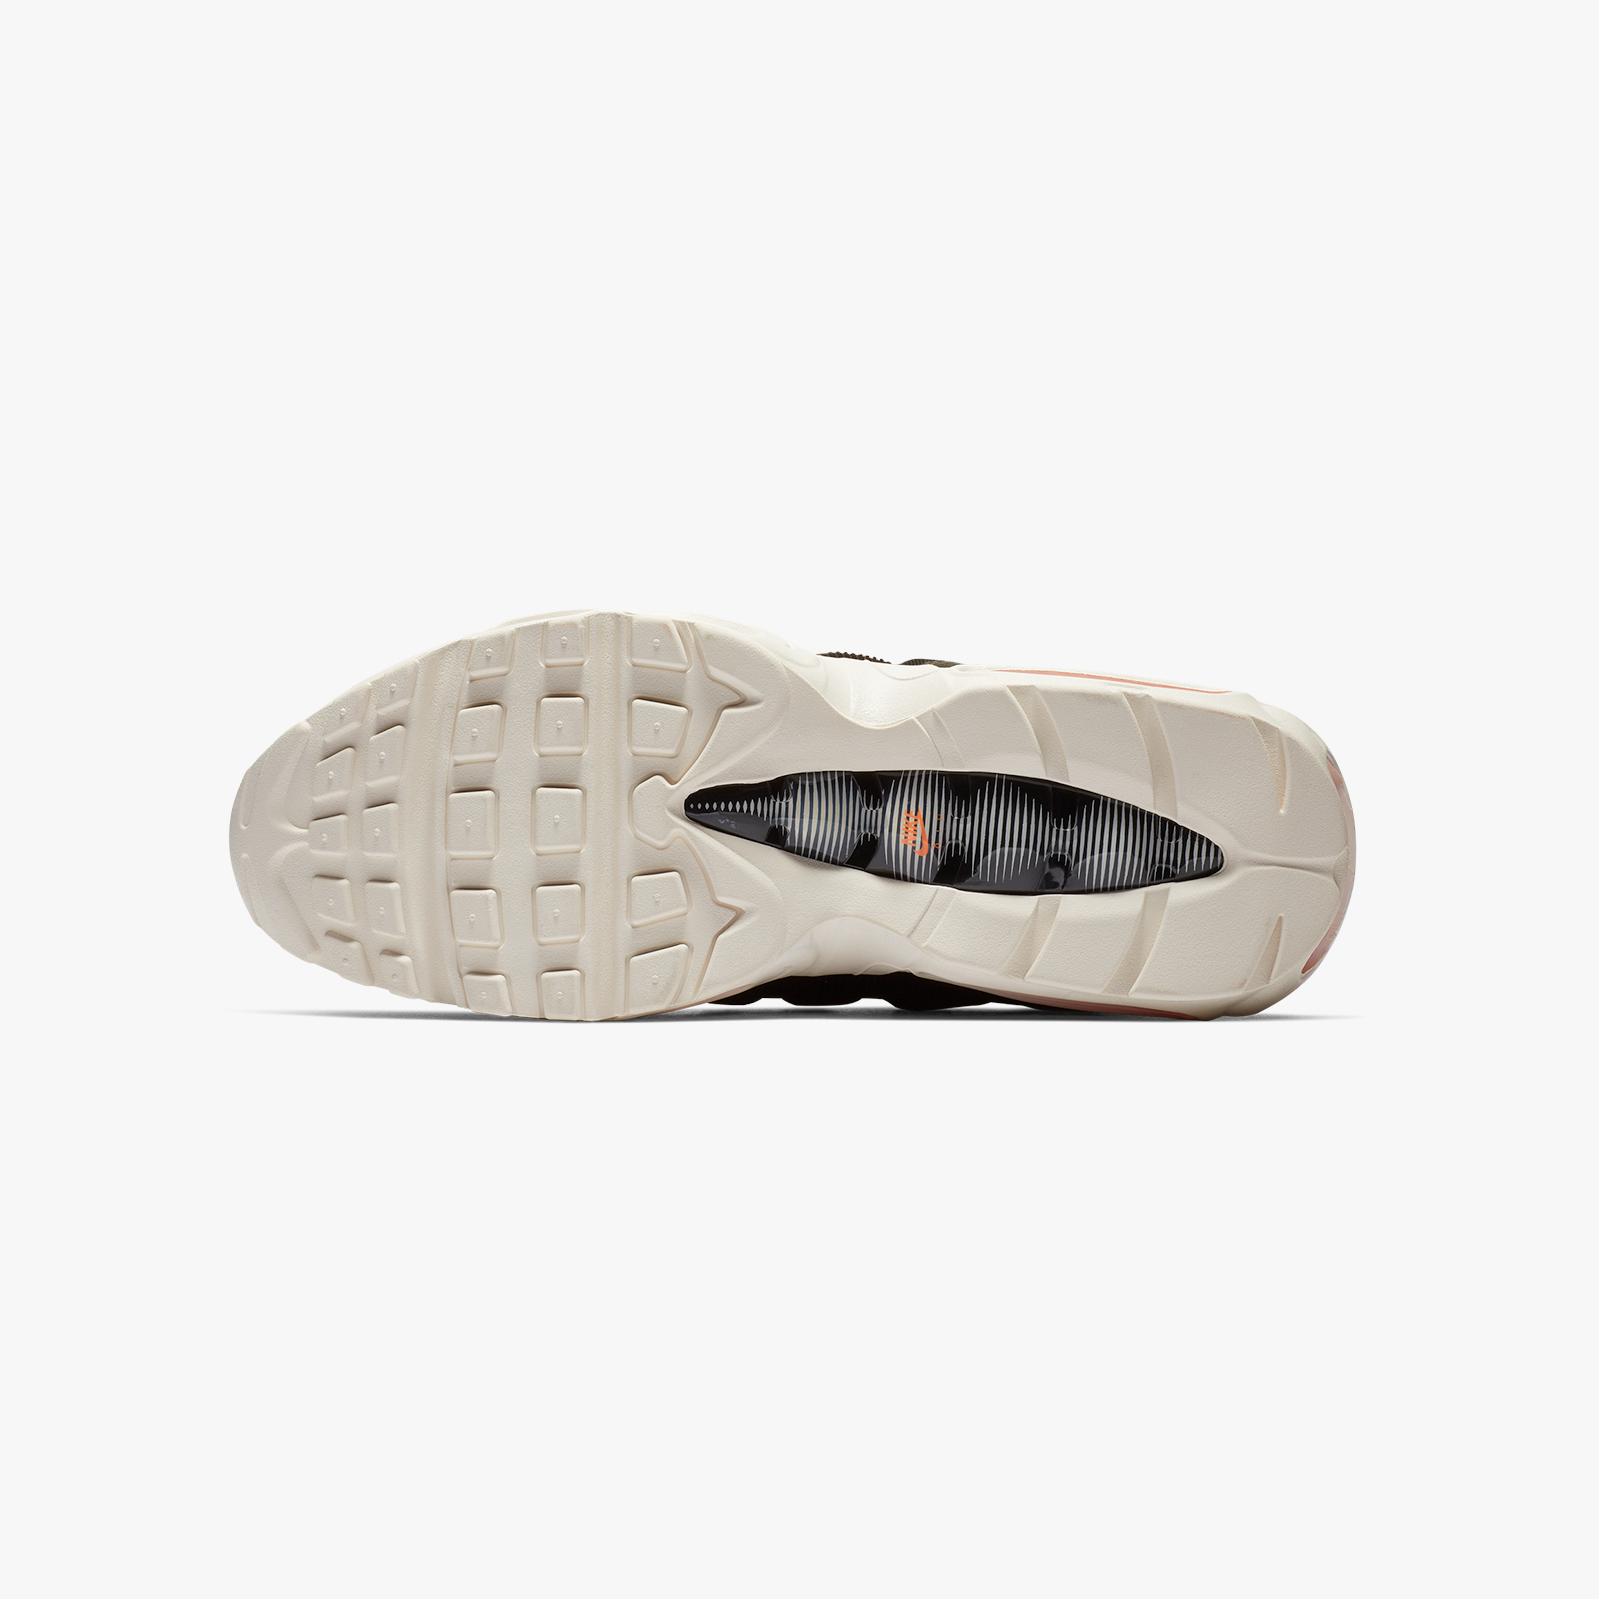 e1d70c5e34f Nike Air Max 95 x Carhartt WIP - Av3866-001 - Sneakersnstuff ...